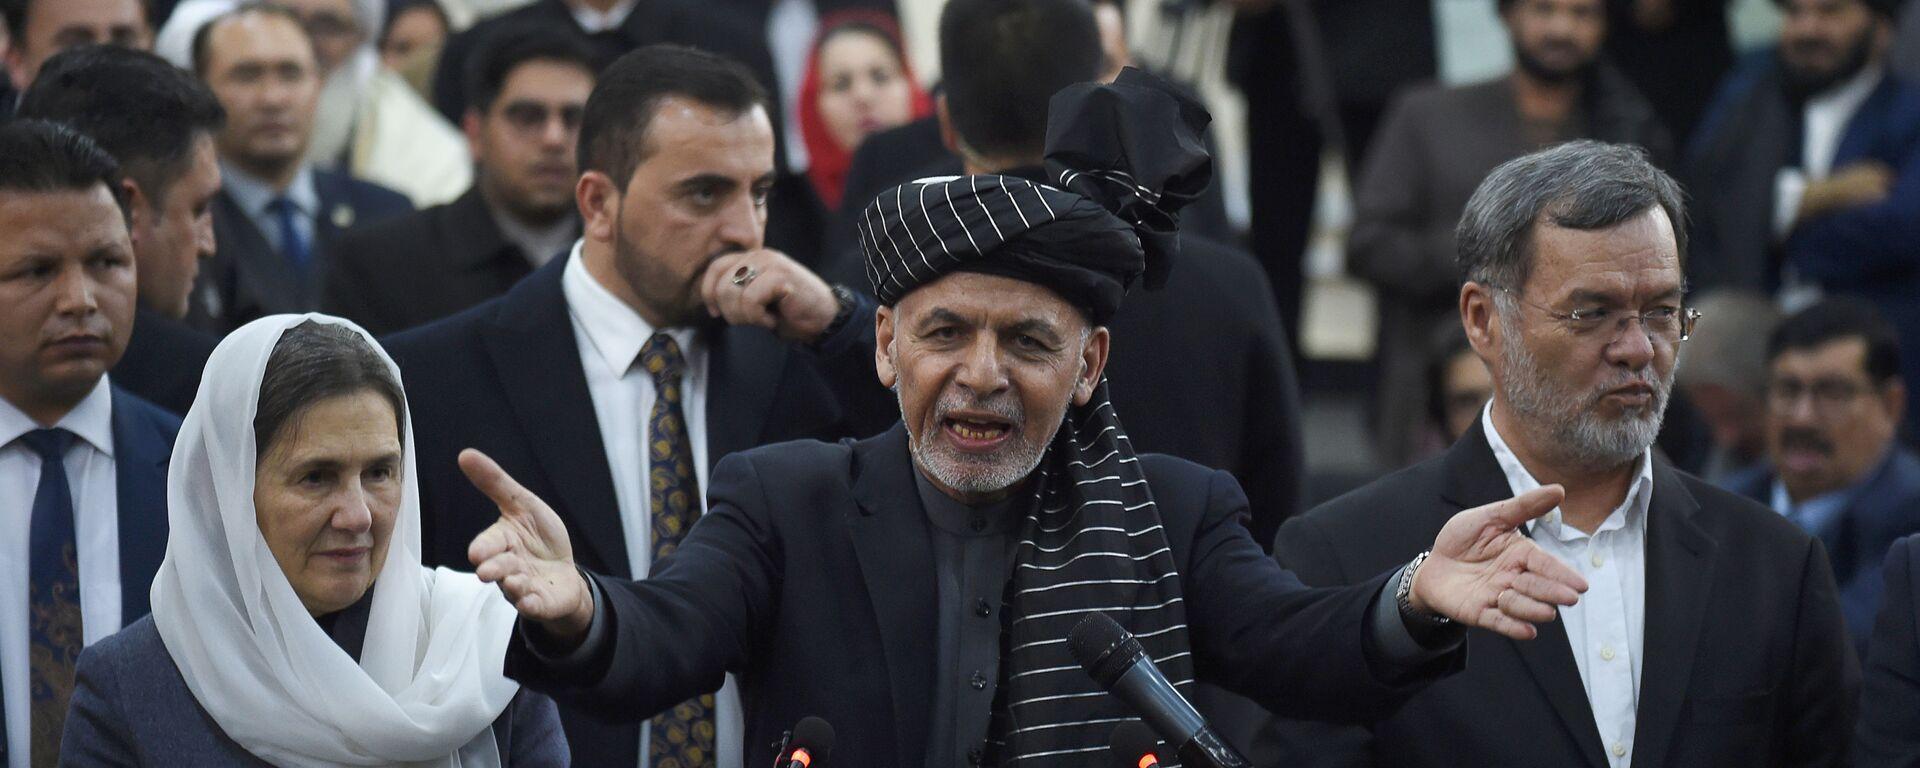 Президент Афганистана Ашраф Гани - Sputnik Таджикистан, 1920, 23.07.2021